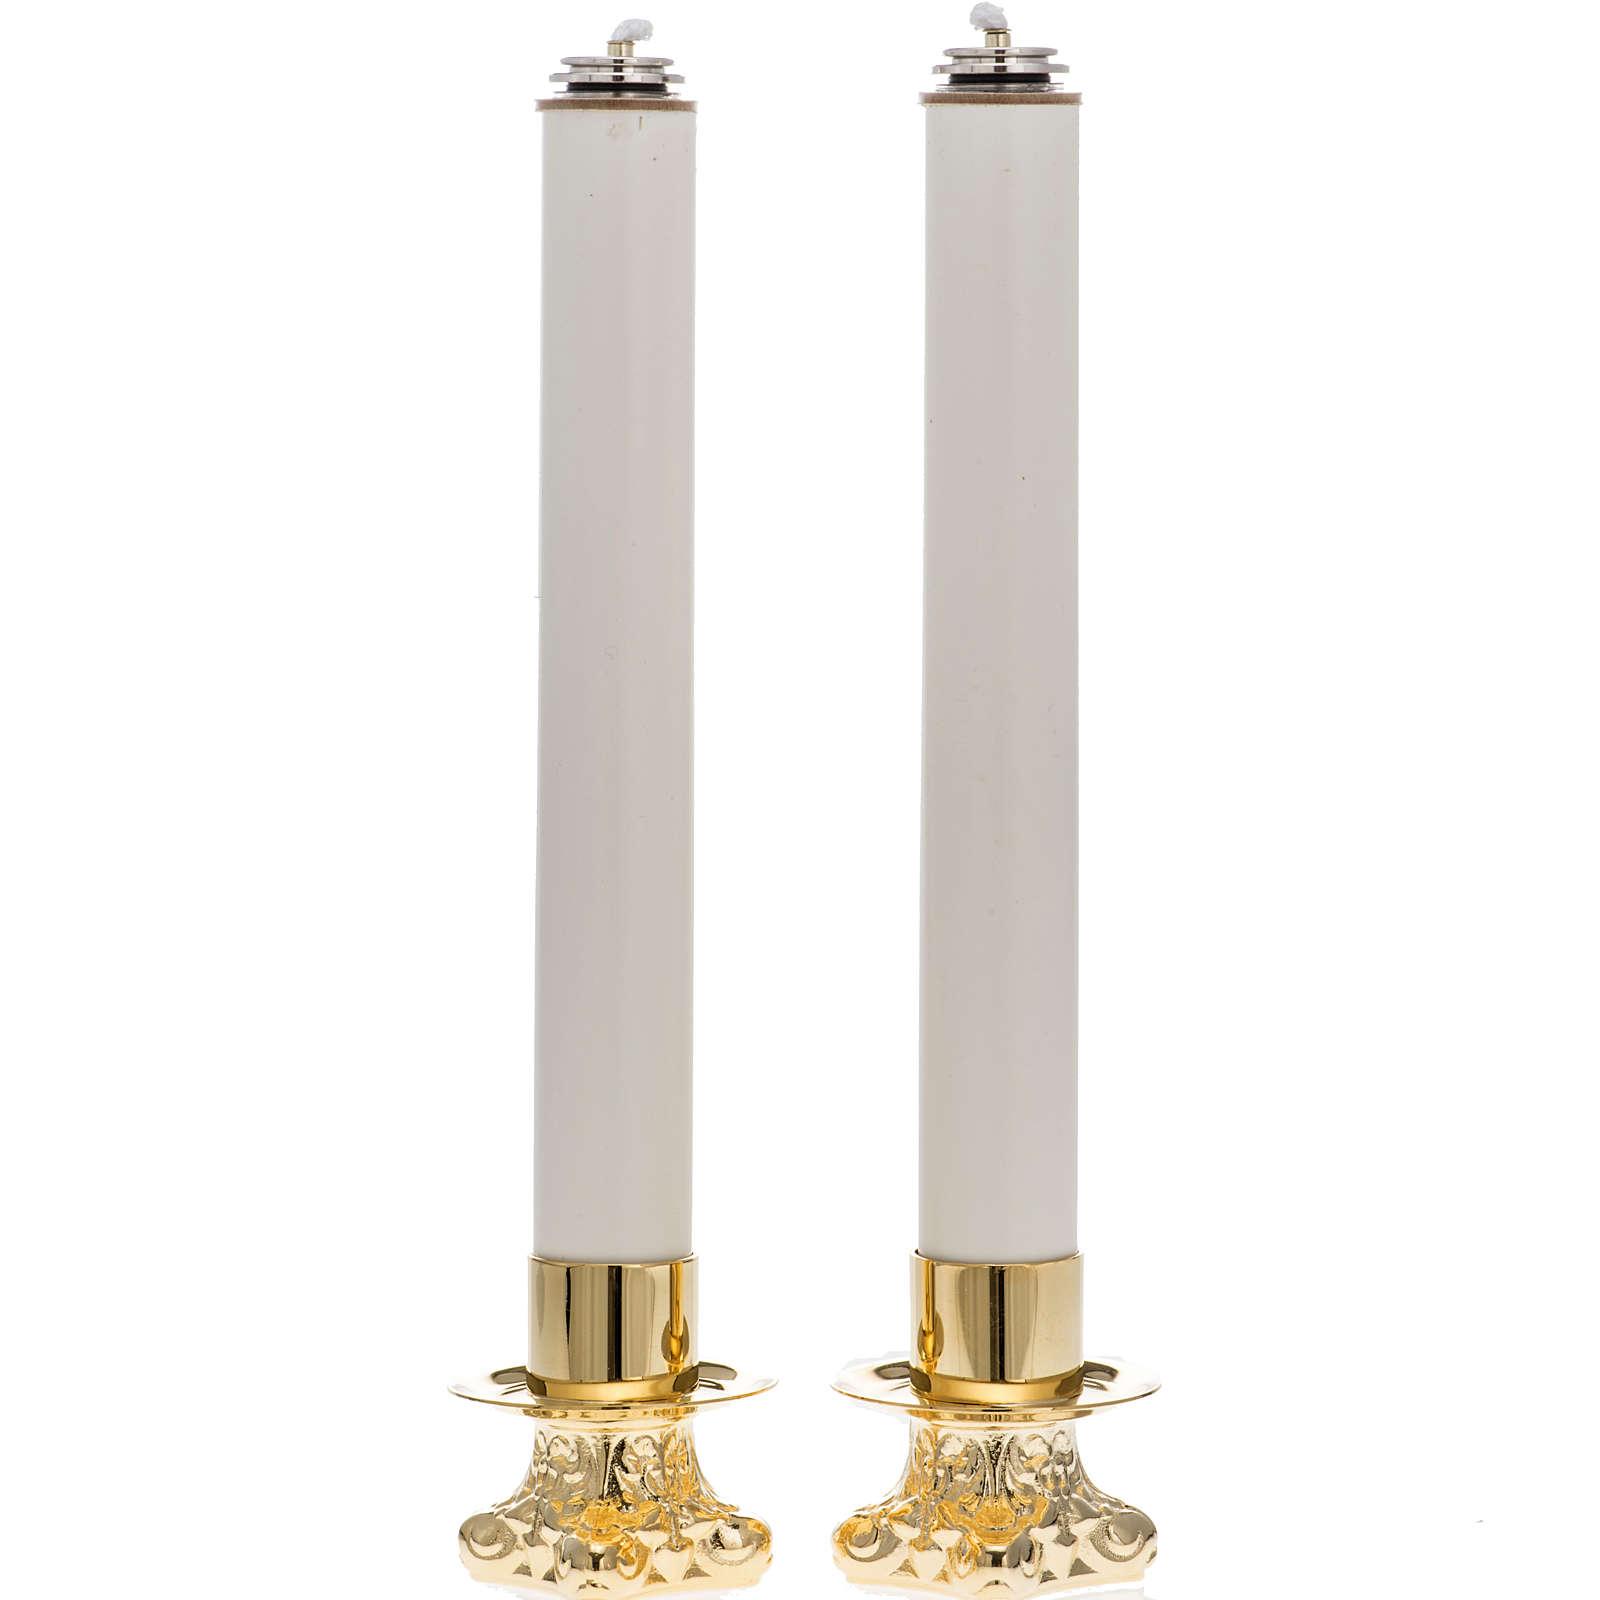 Candelabros con base dorada y velas falsas 4